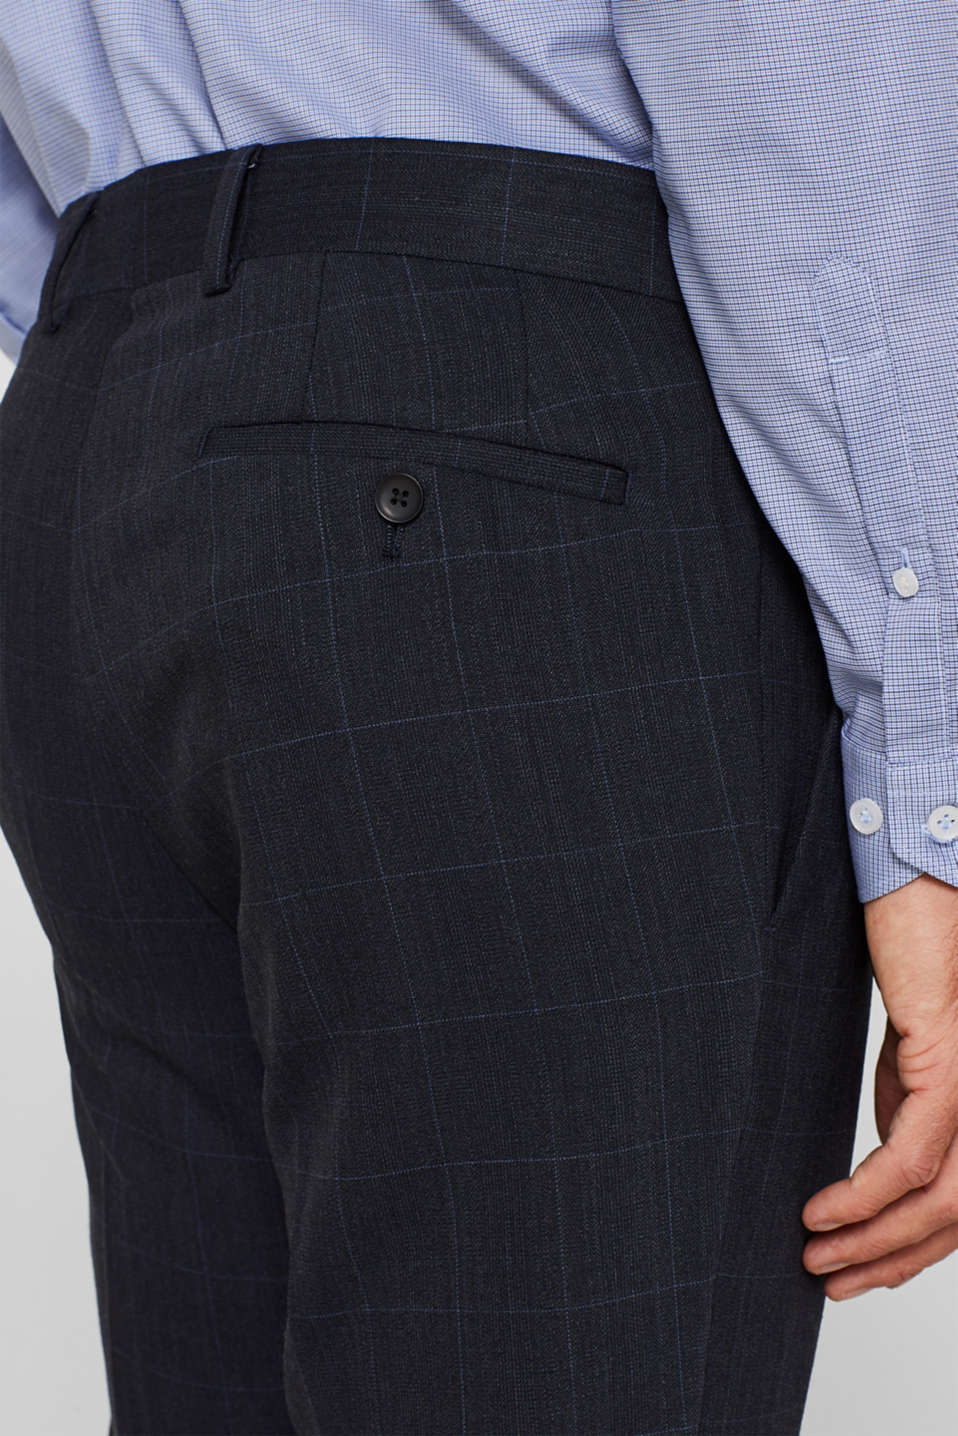 Pants suit, DARK BLUE, detail image number 5